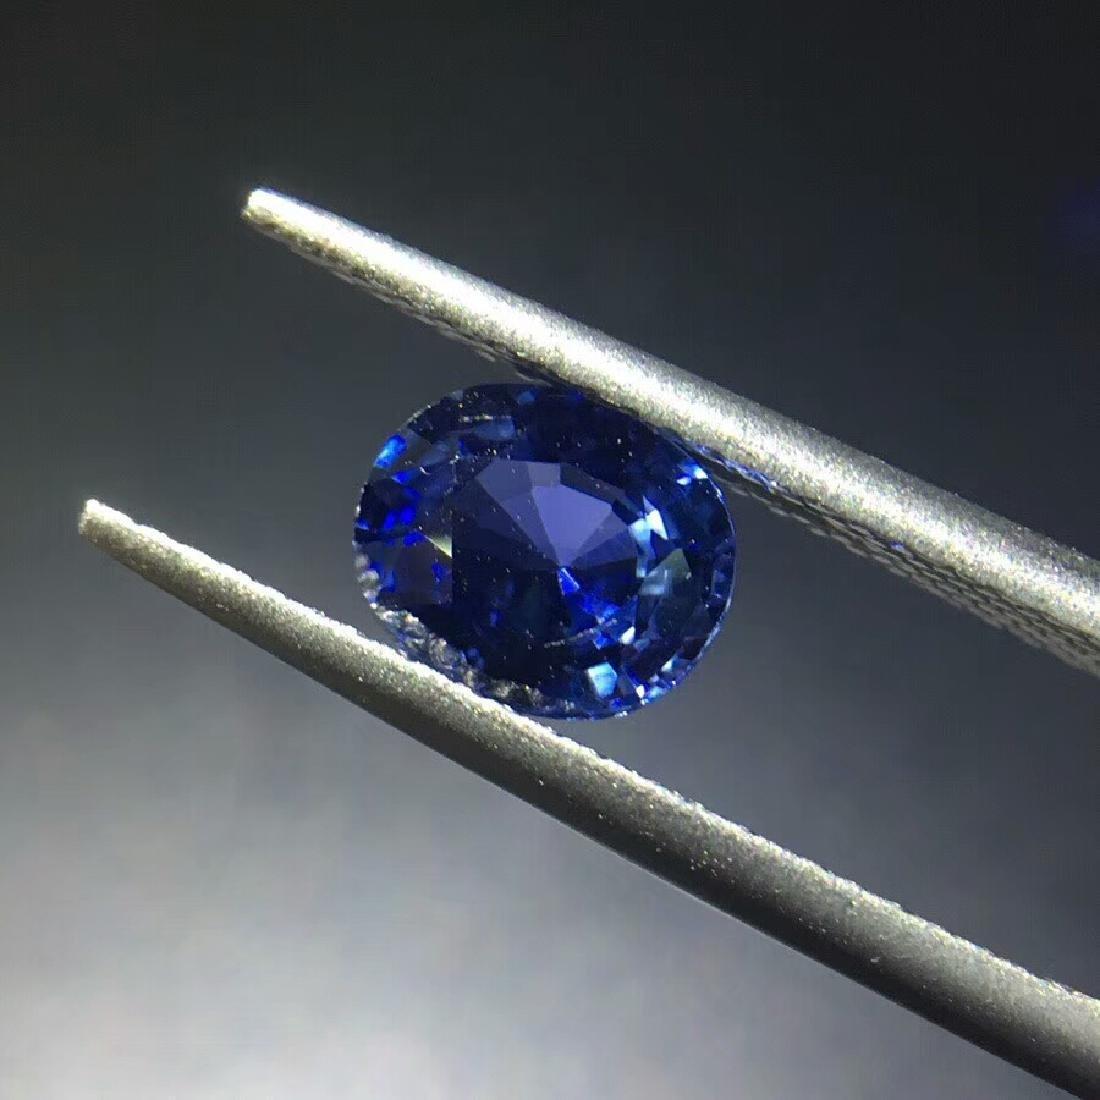 1.05 ct Emerald 6.0*7.8*3.2 mm Oval Cut - 9